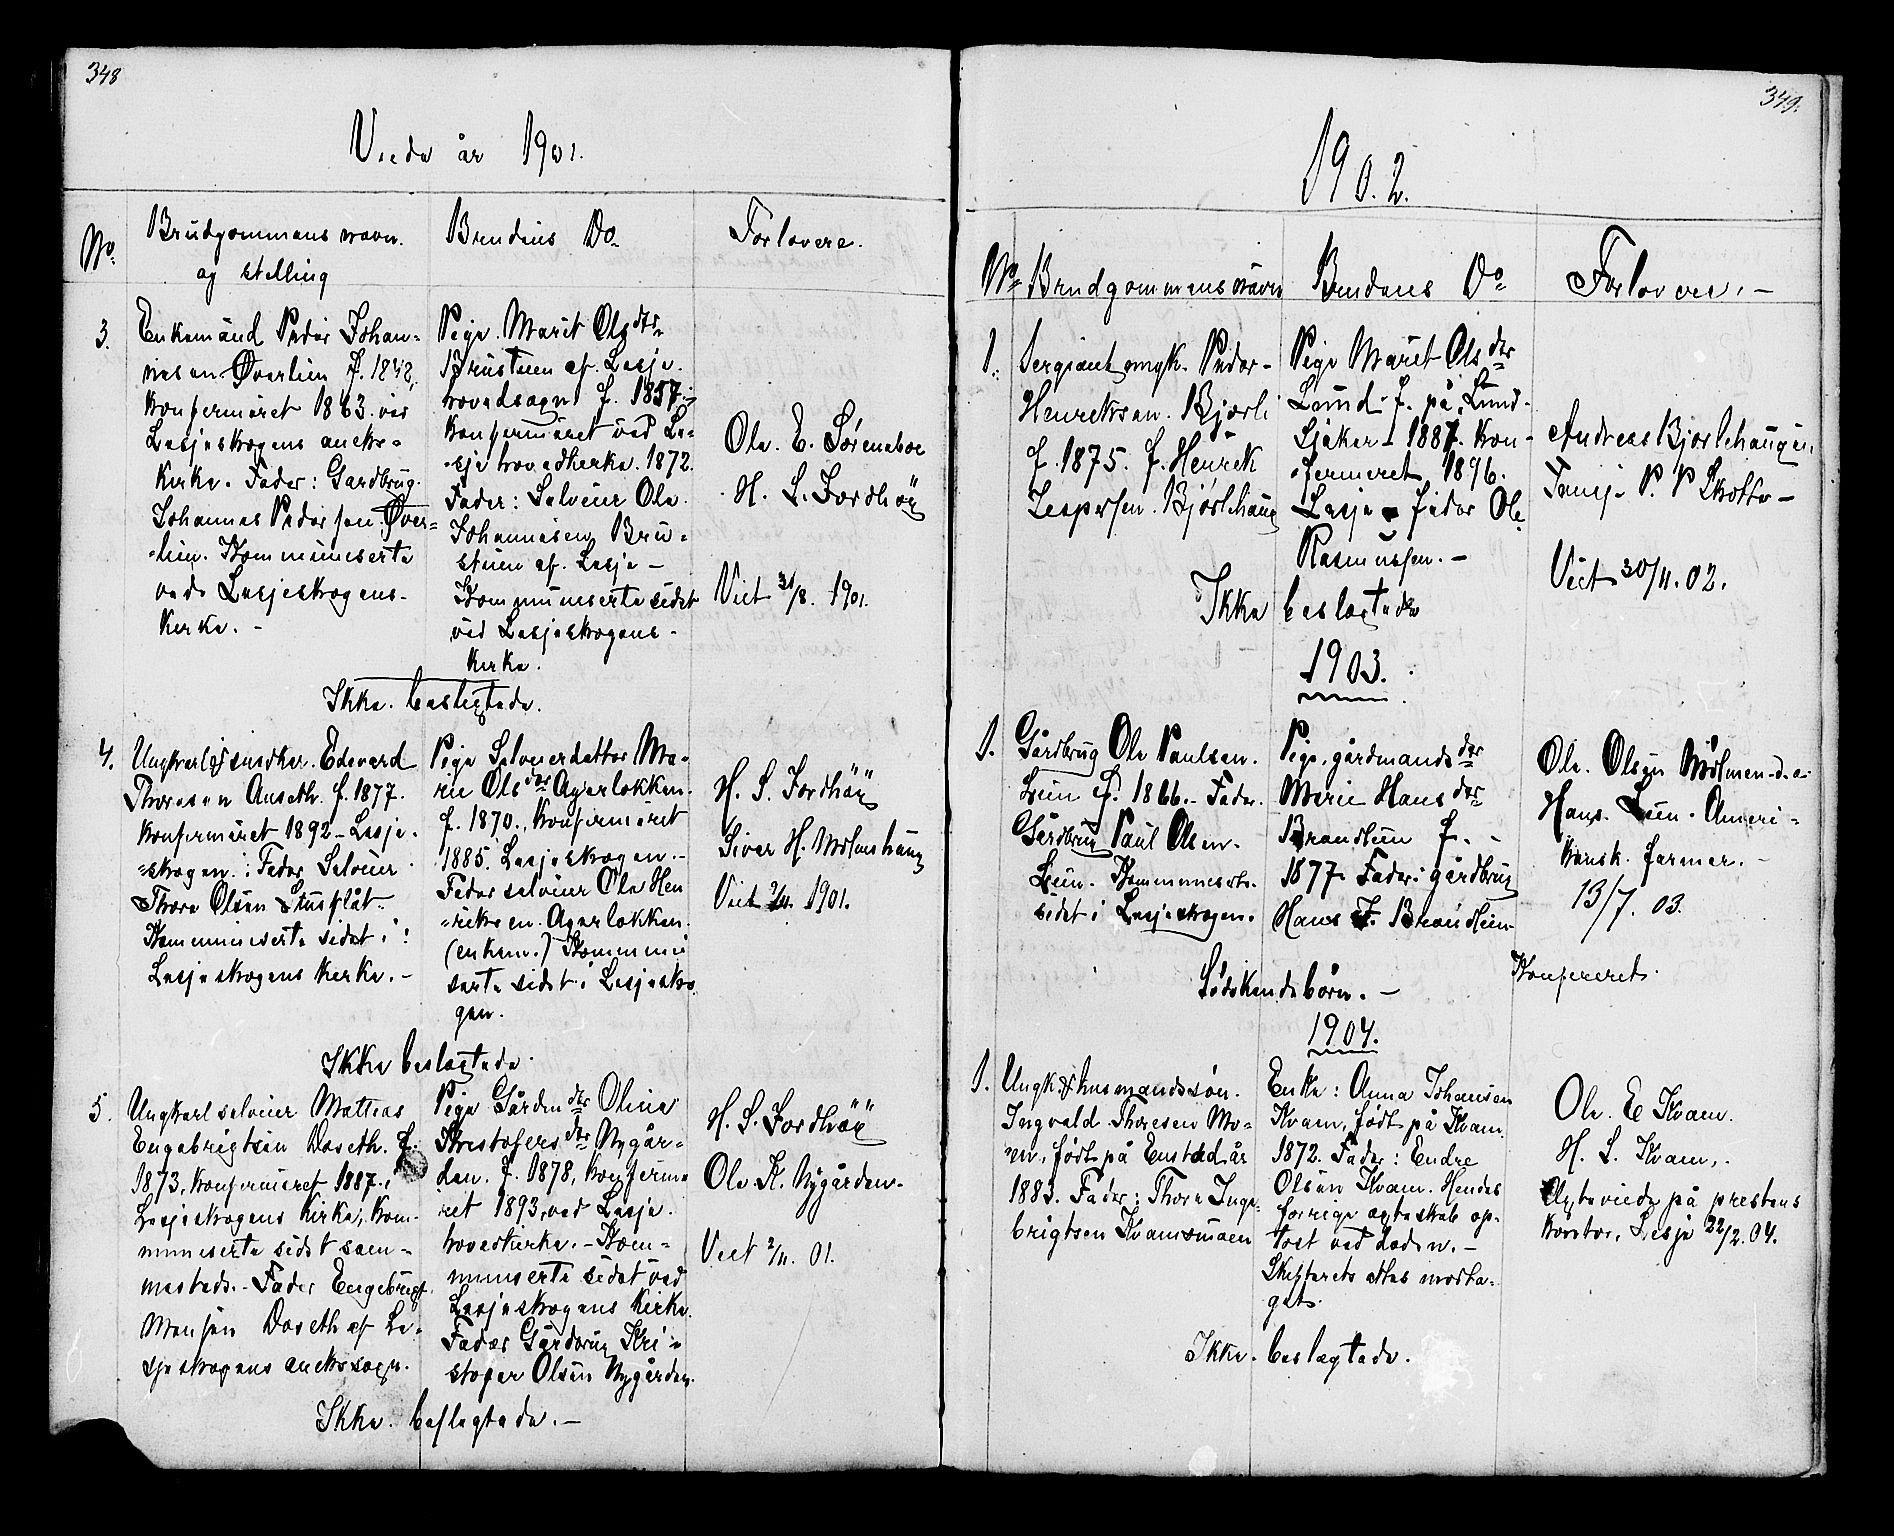 SAH, Lesja prestekontor, Klokkerbok nr. 6, 1871-1904, s. 348-349